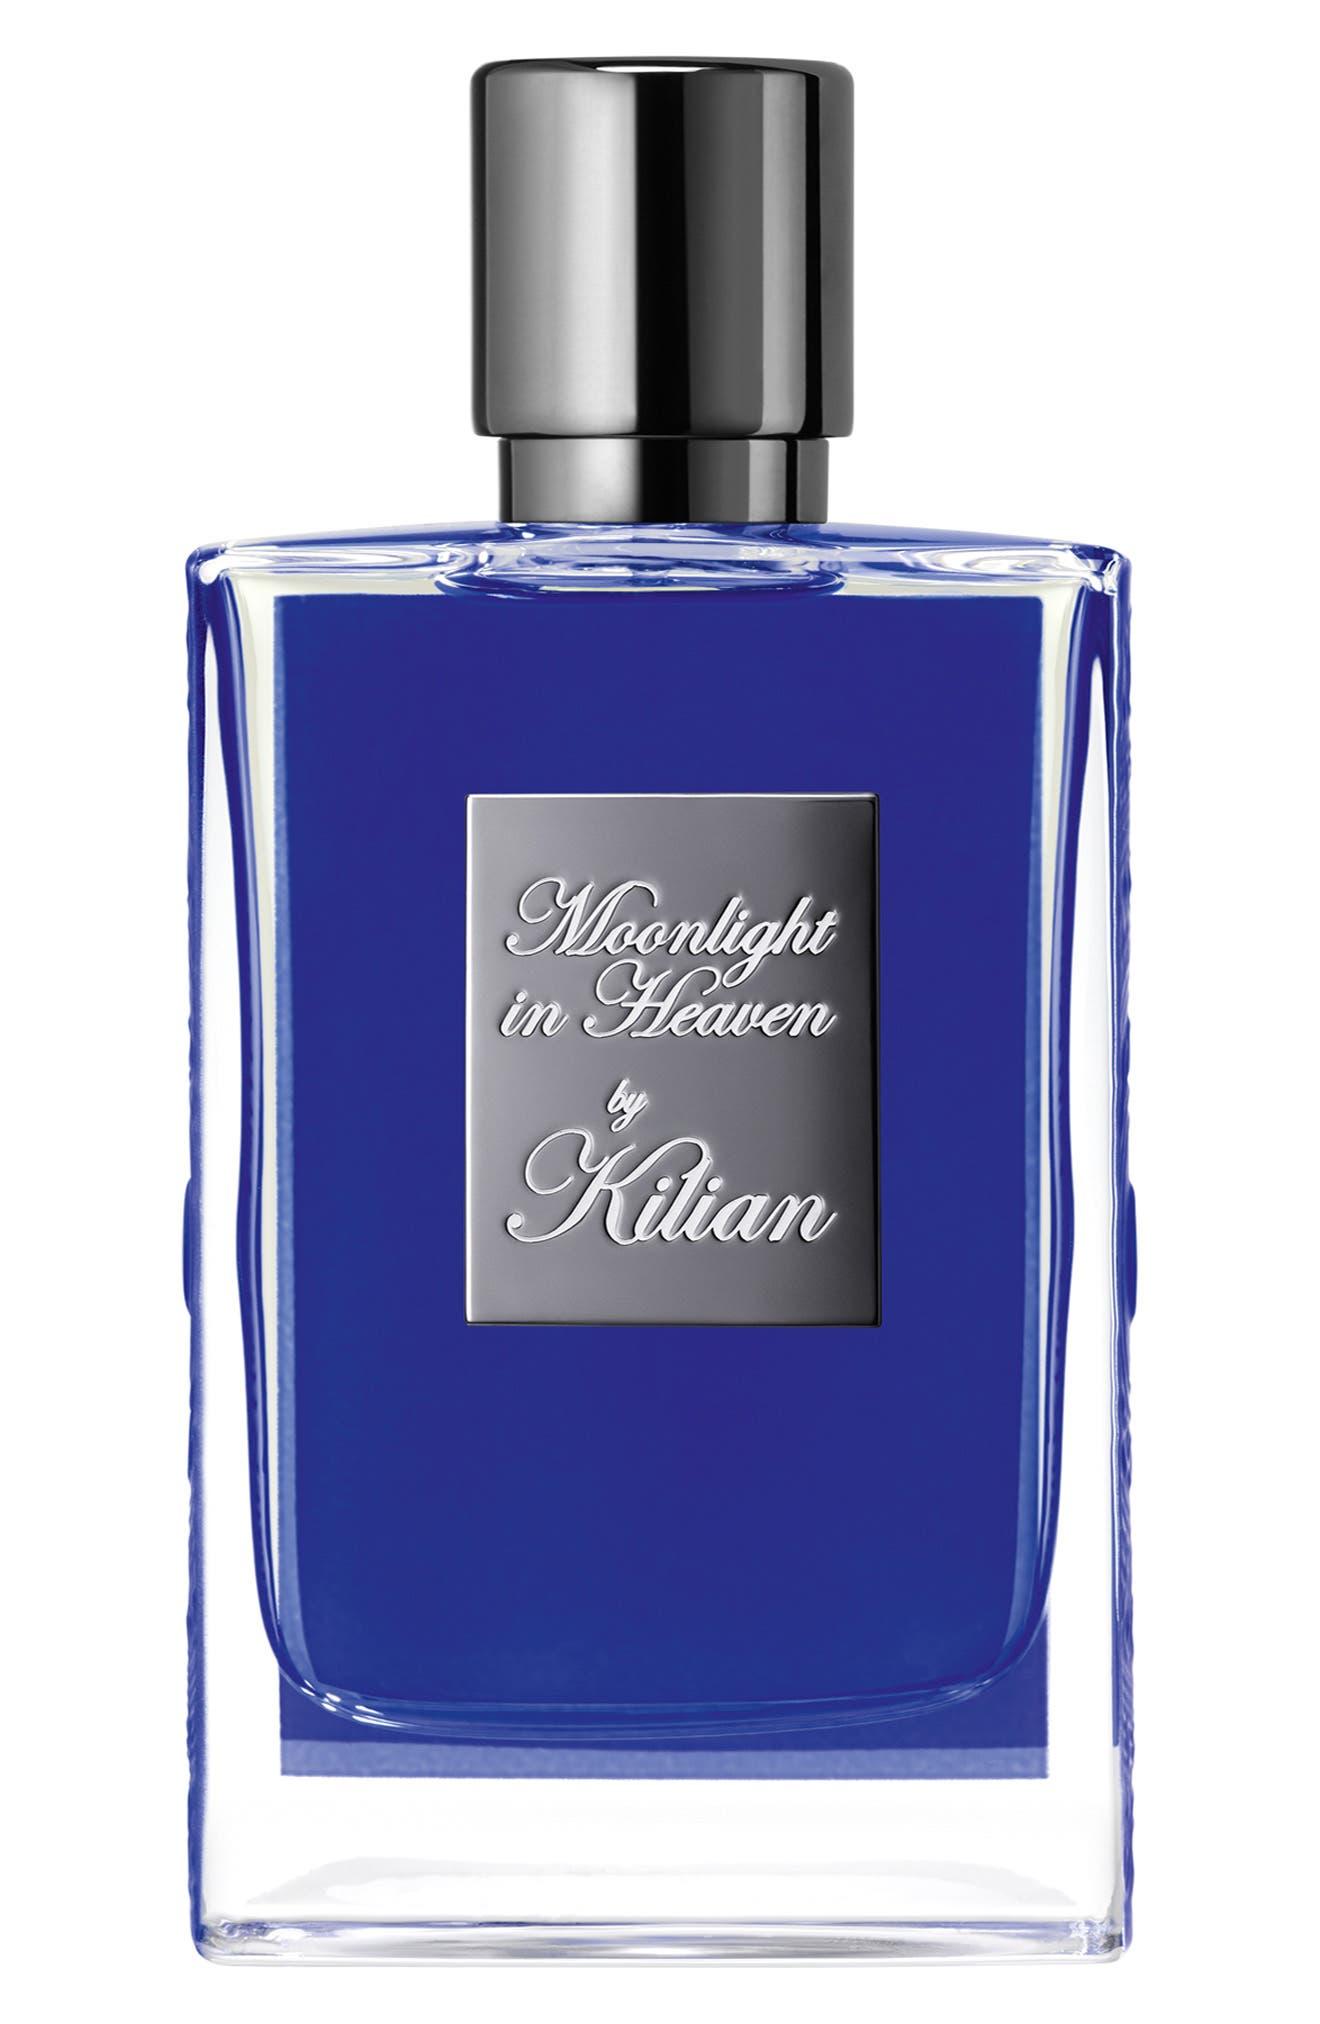 Kilian Fresh Moonlight In Heaven Refillable Perfume